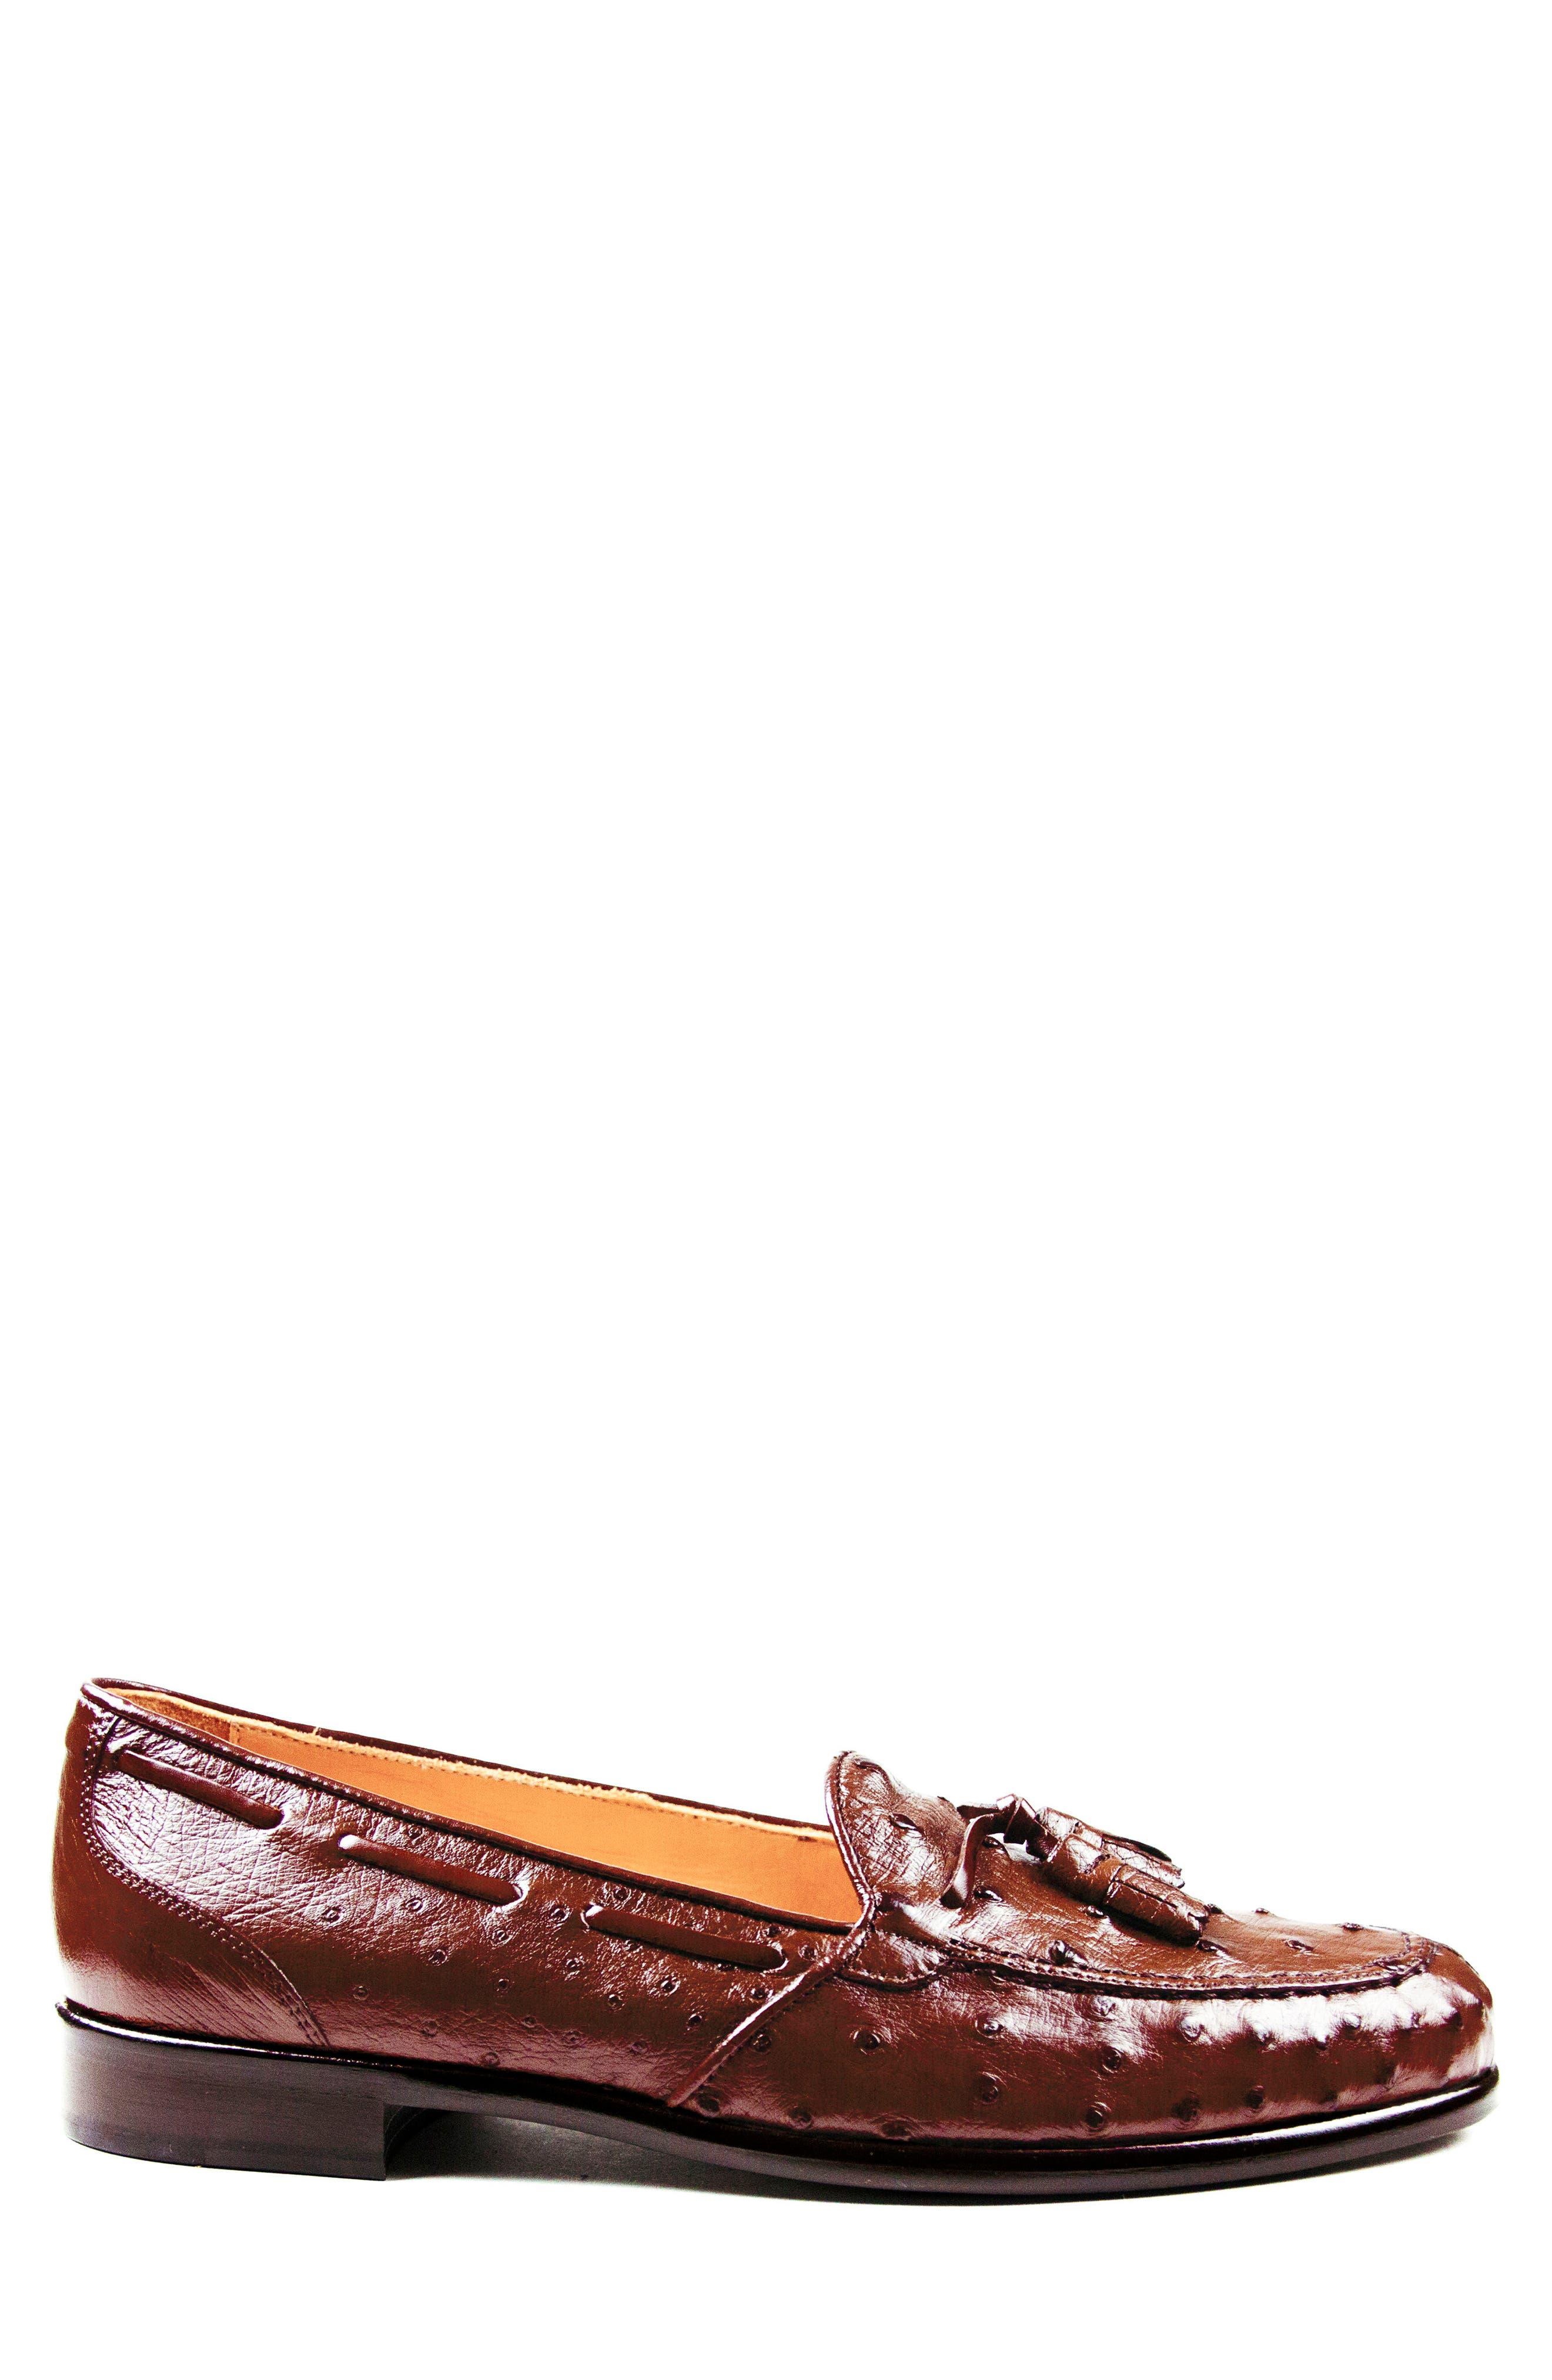 Franco Tassel Exotic Leather Loafer,                             Alternate thumbnail 6, color,